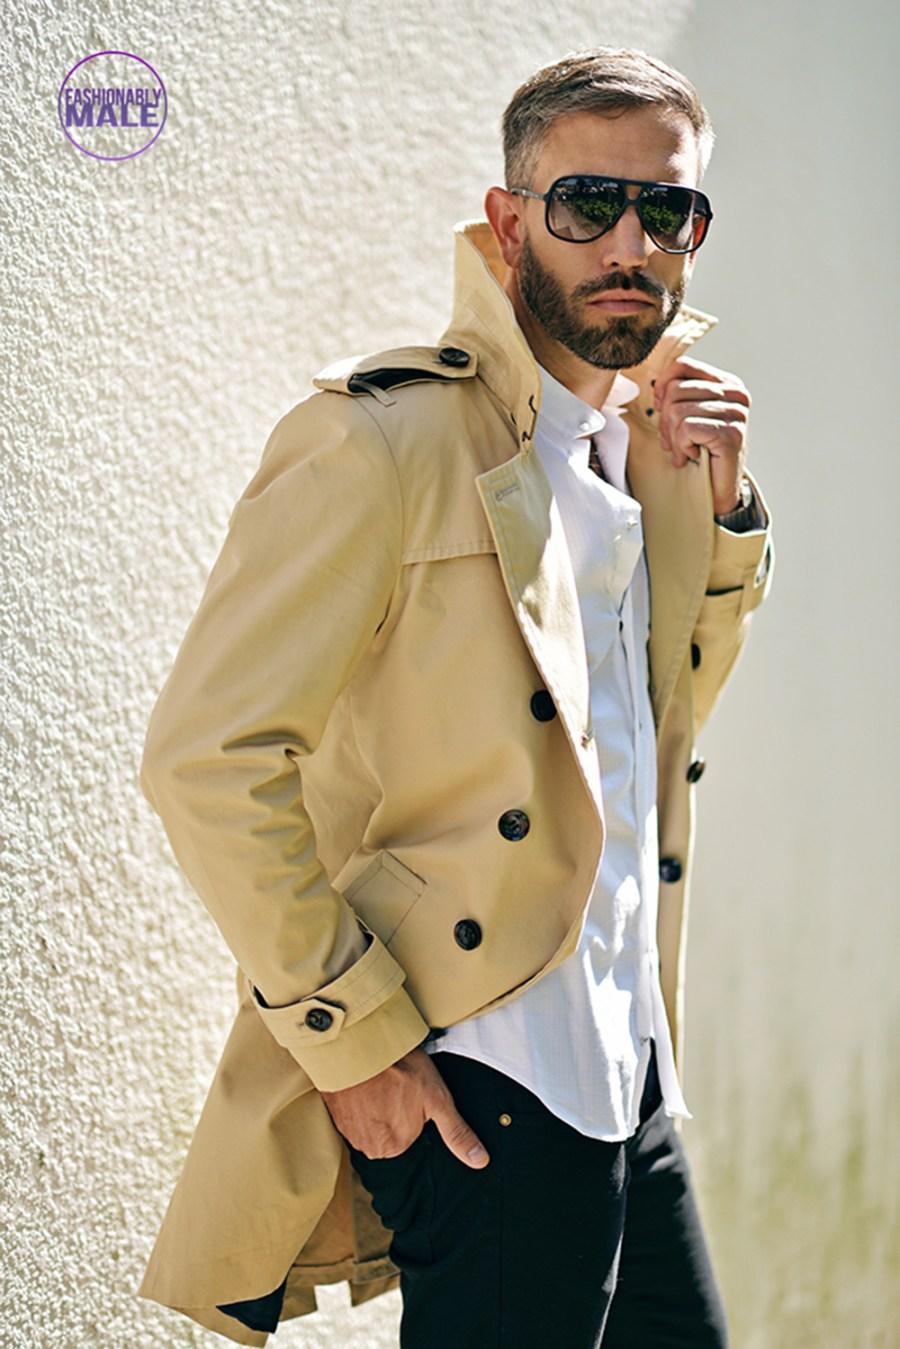 Stephane Marti by Shotsbygun for Fashionably Male1